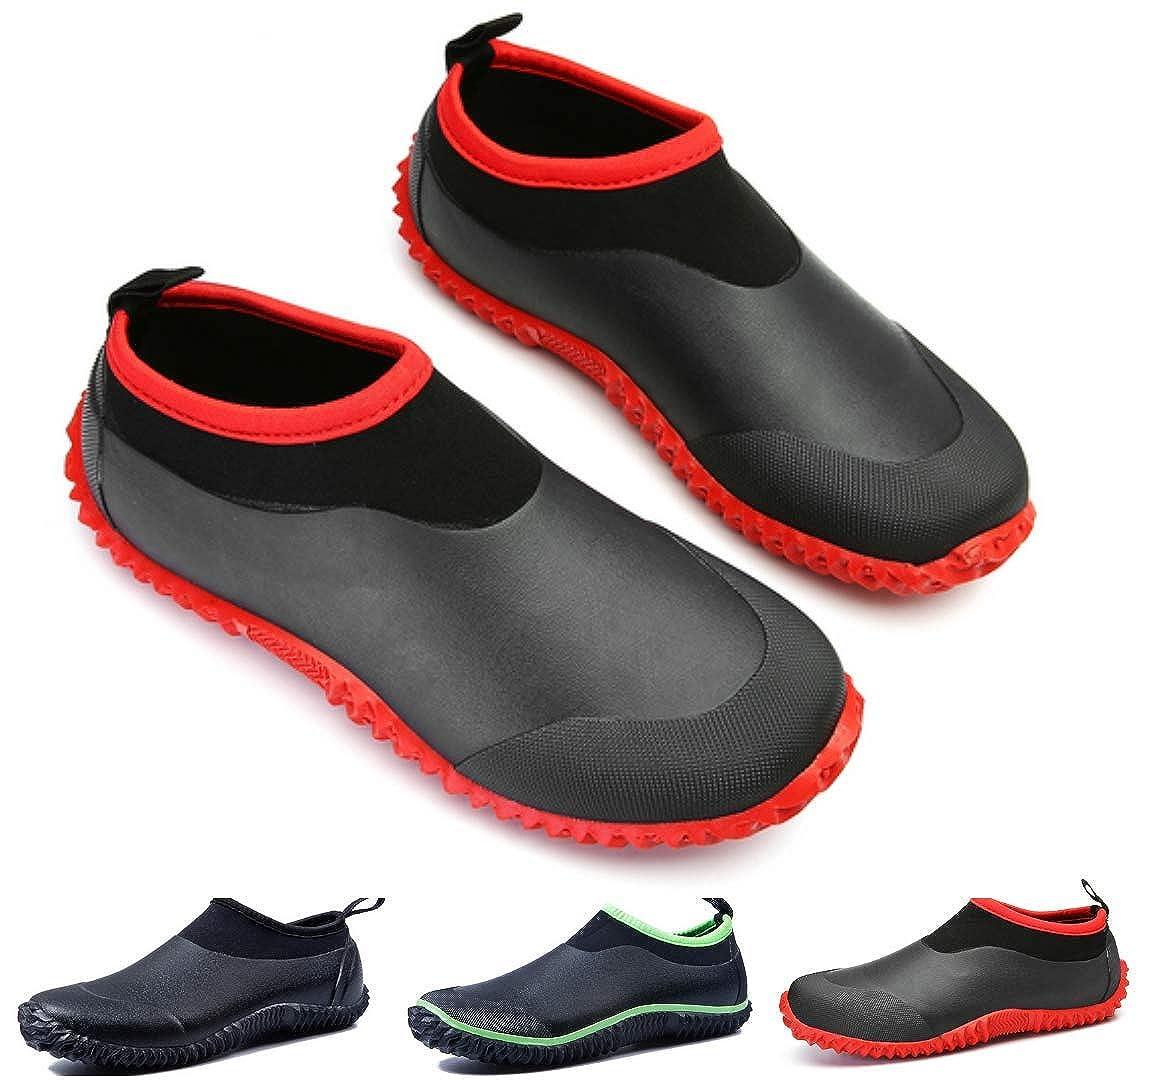 The Best Garden Ducks With Rain Boots